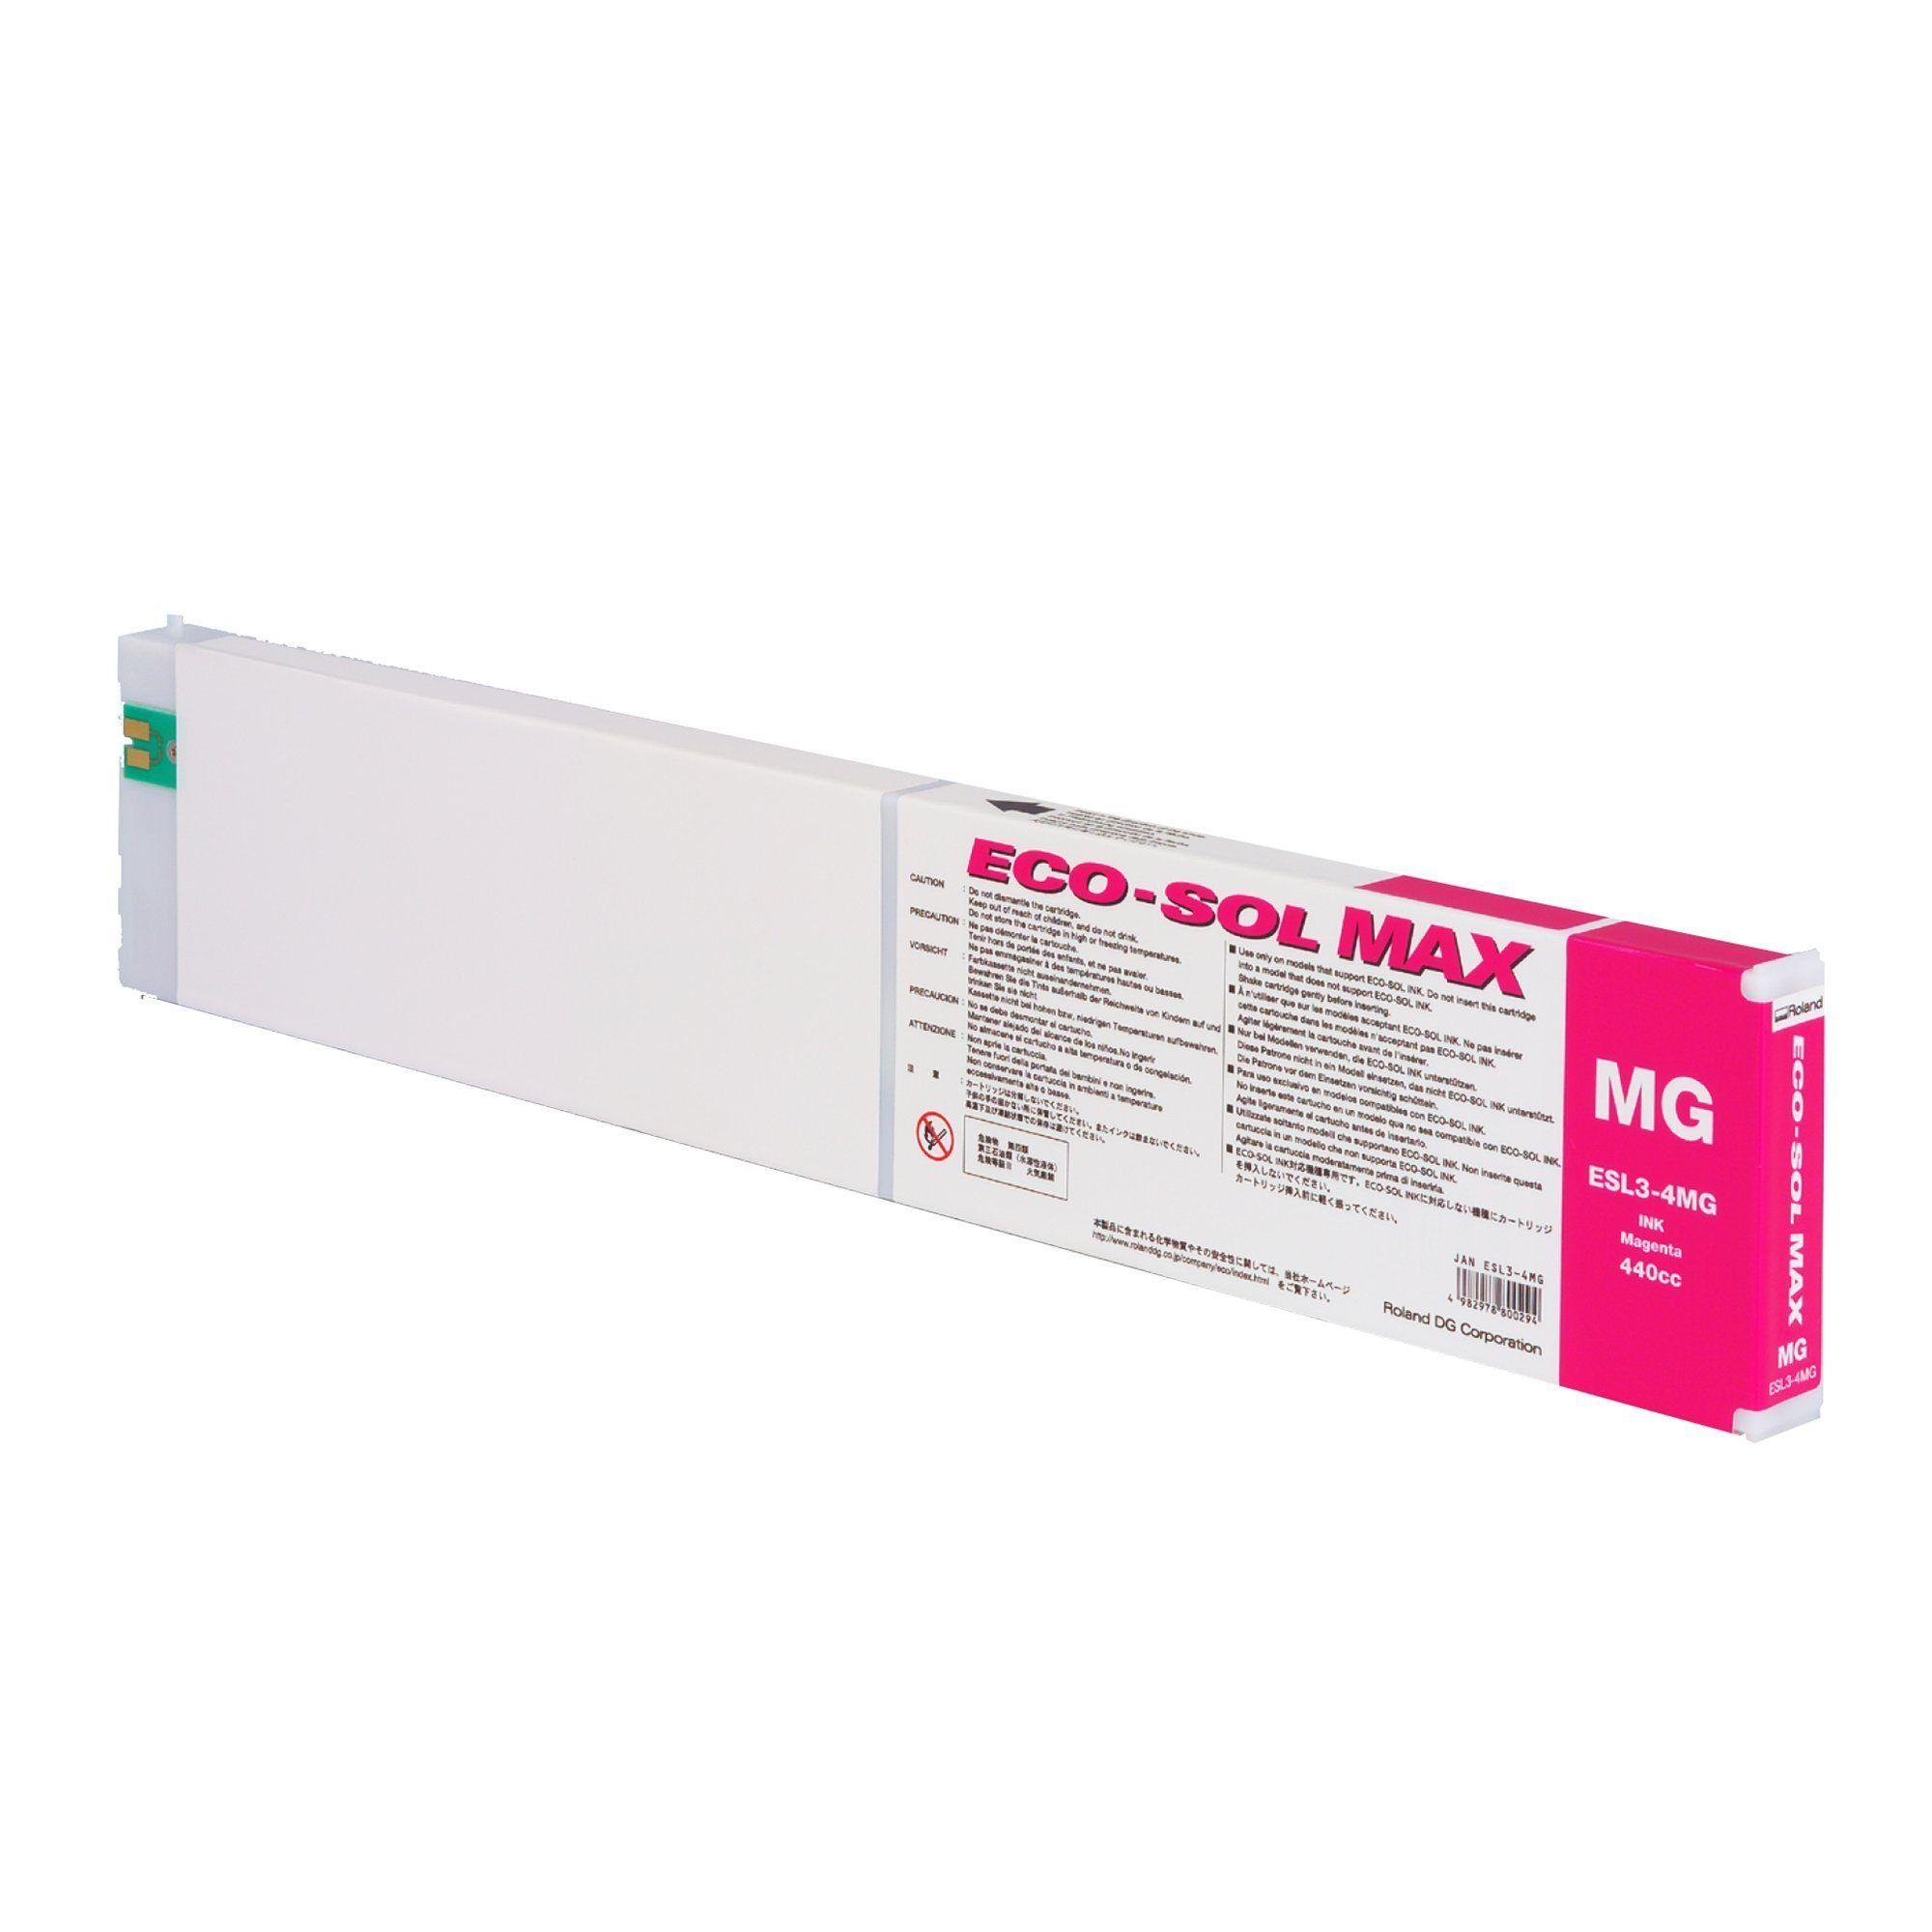 Pin On Adhesive Vinyl Amp Transfer Tape